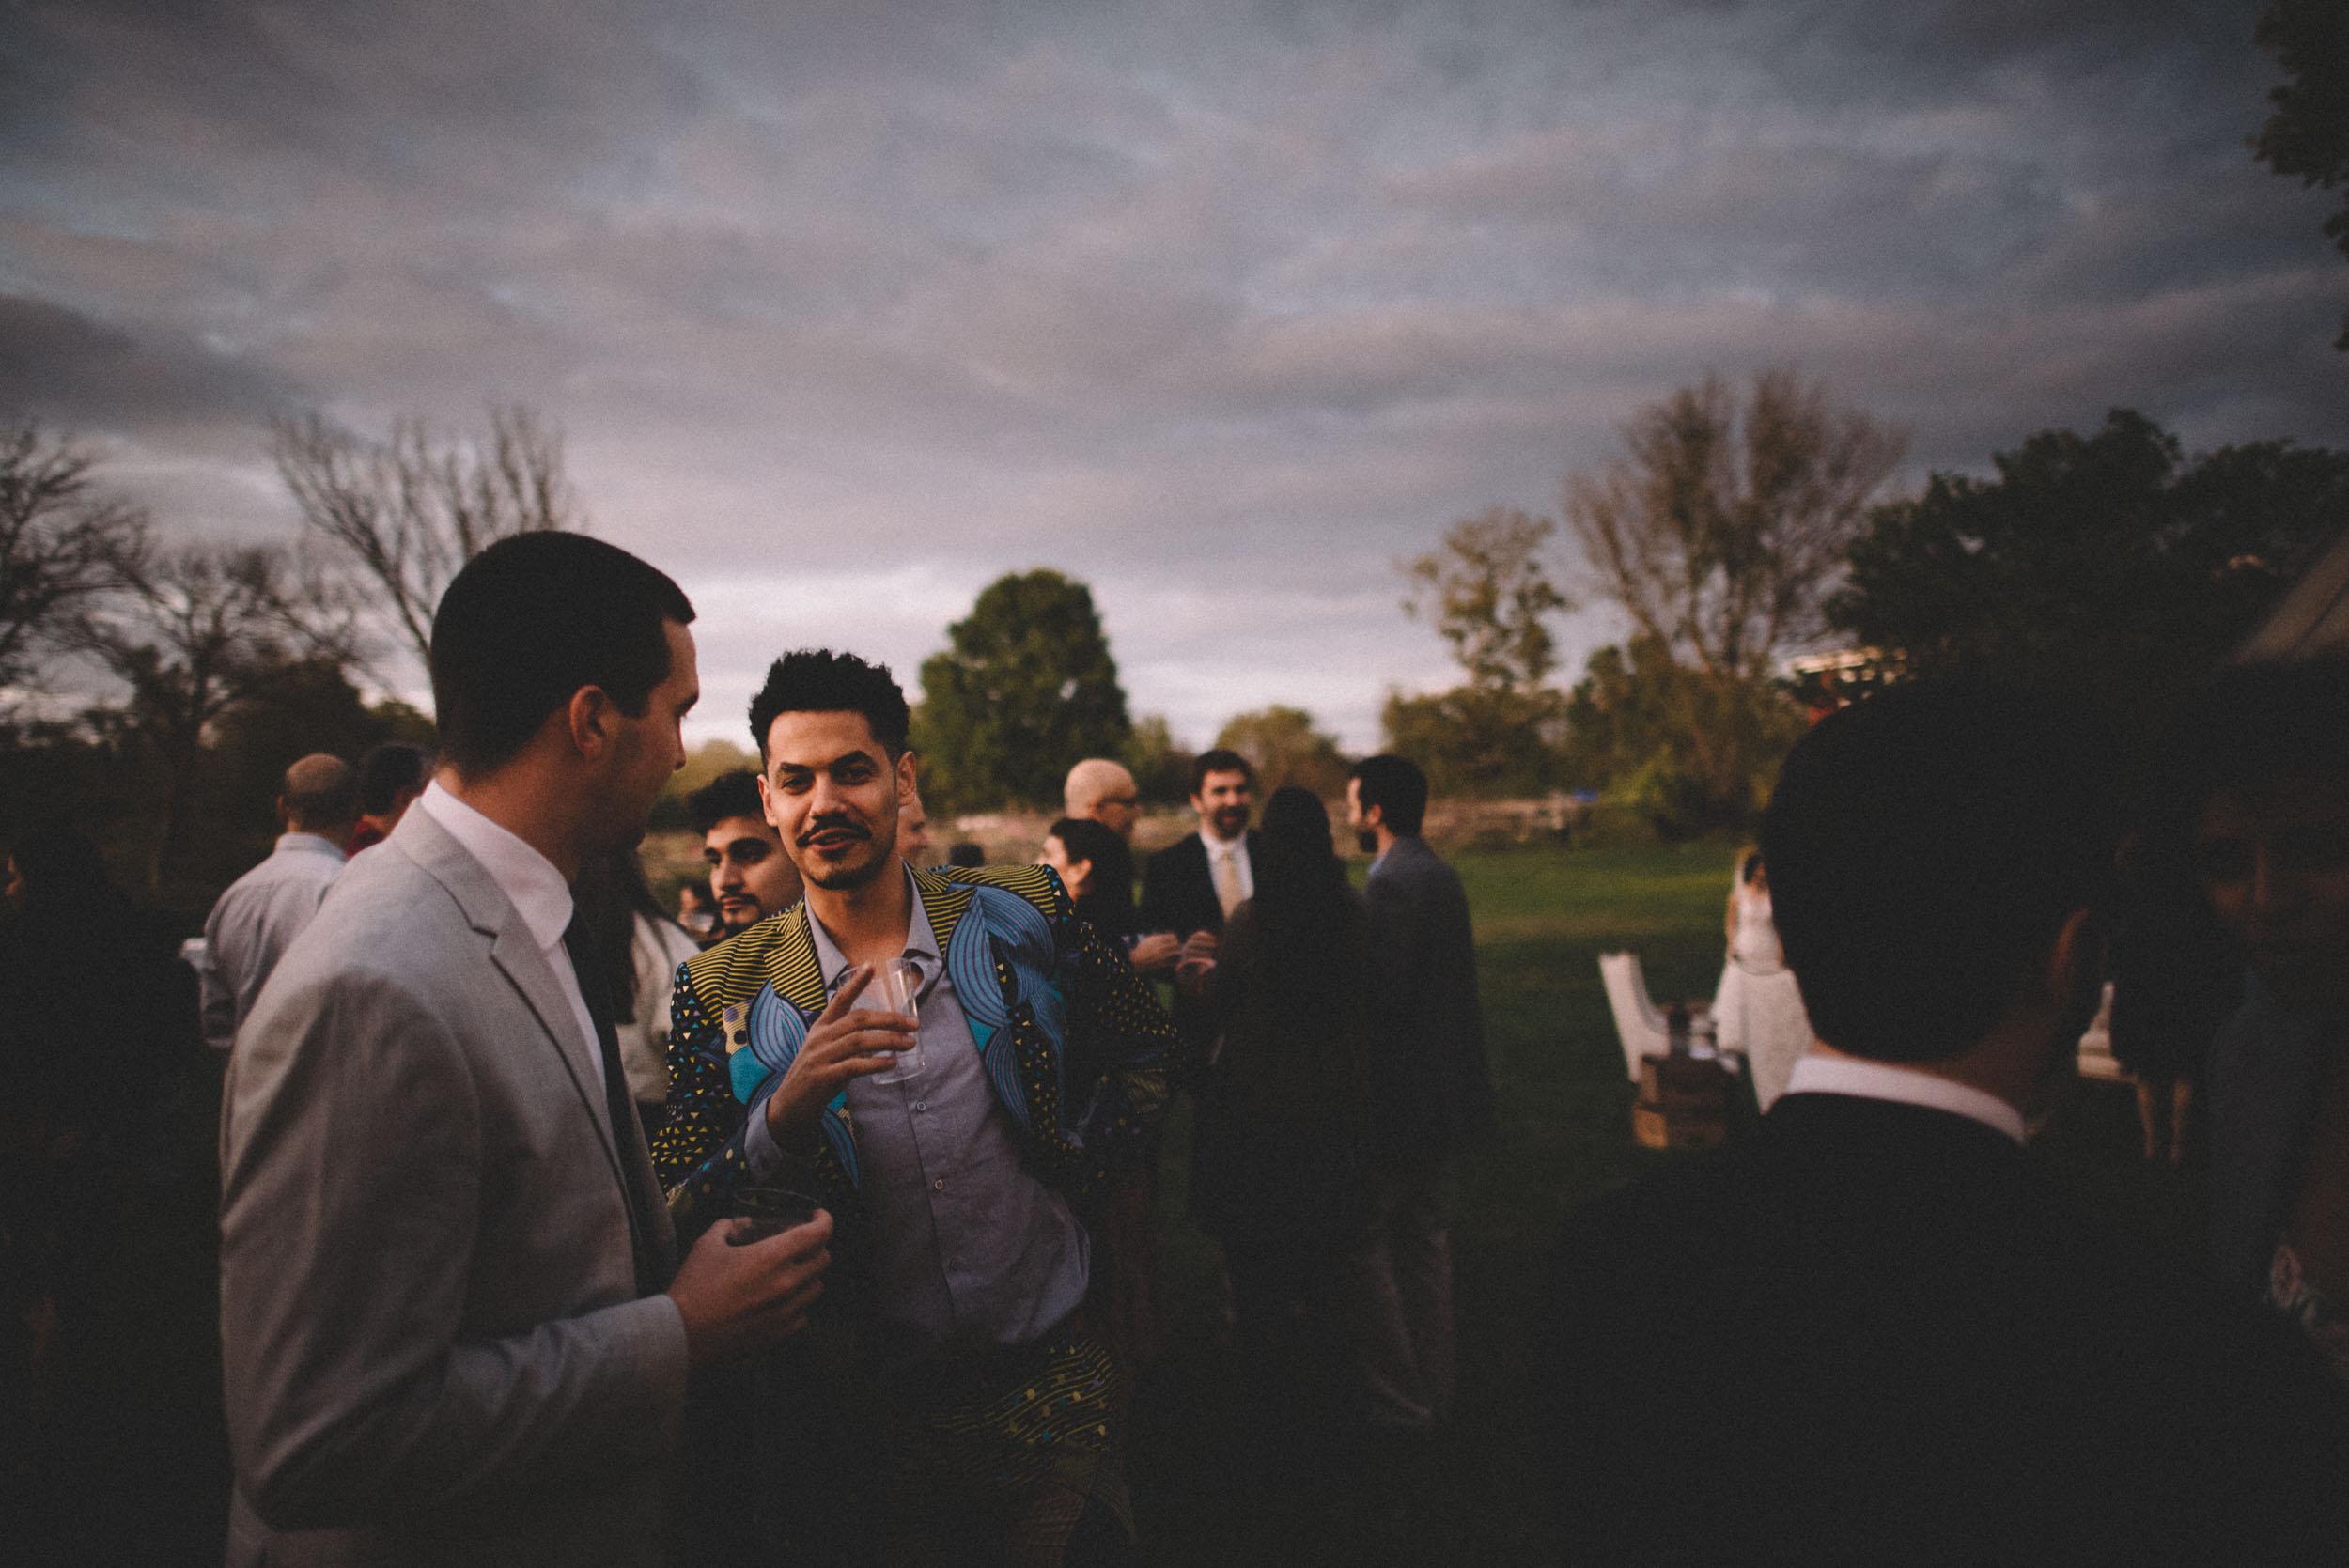 poolseville-maryland-wedding-photographer-56.jpg